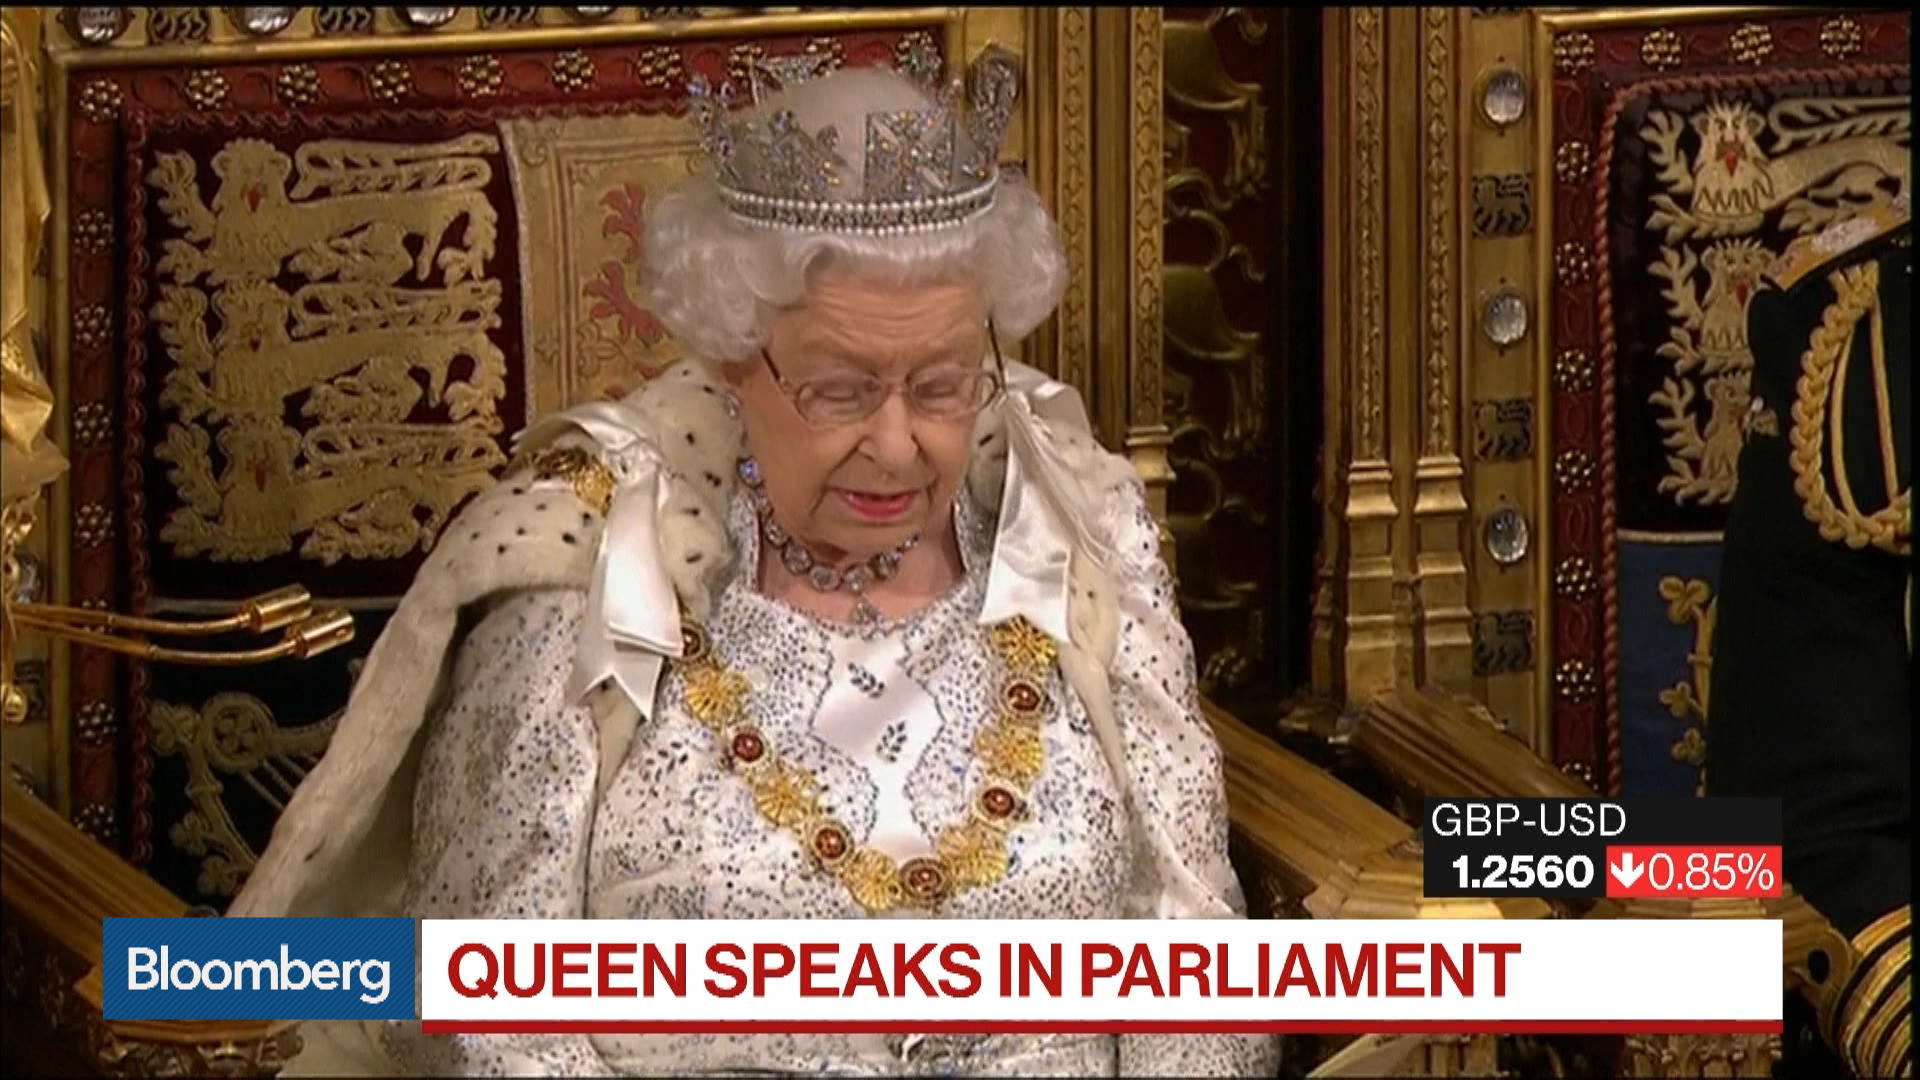 Boris Johnson's Policies Center Around Brexit as Queen Elizabeth II Sets Out U.K. Legislative Agenda